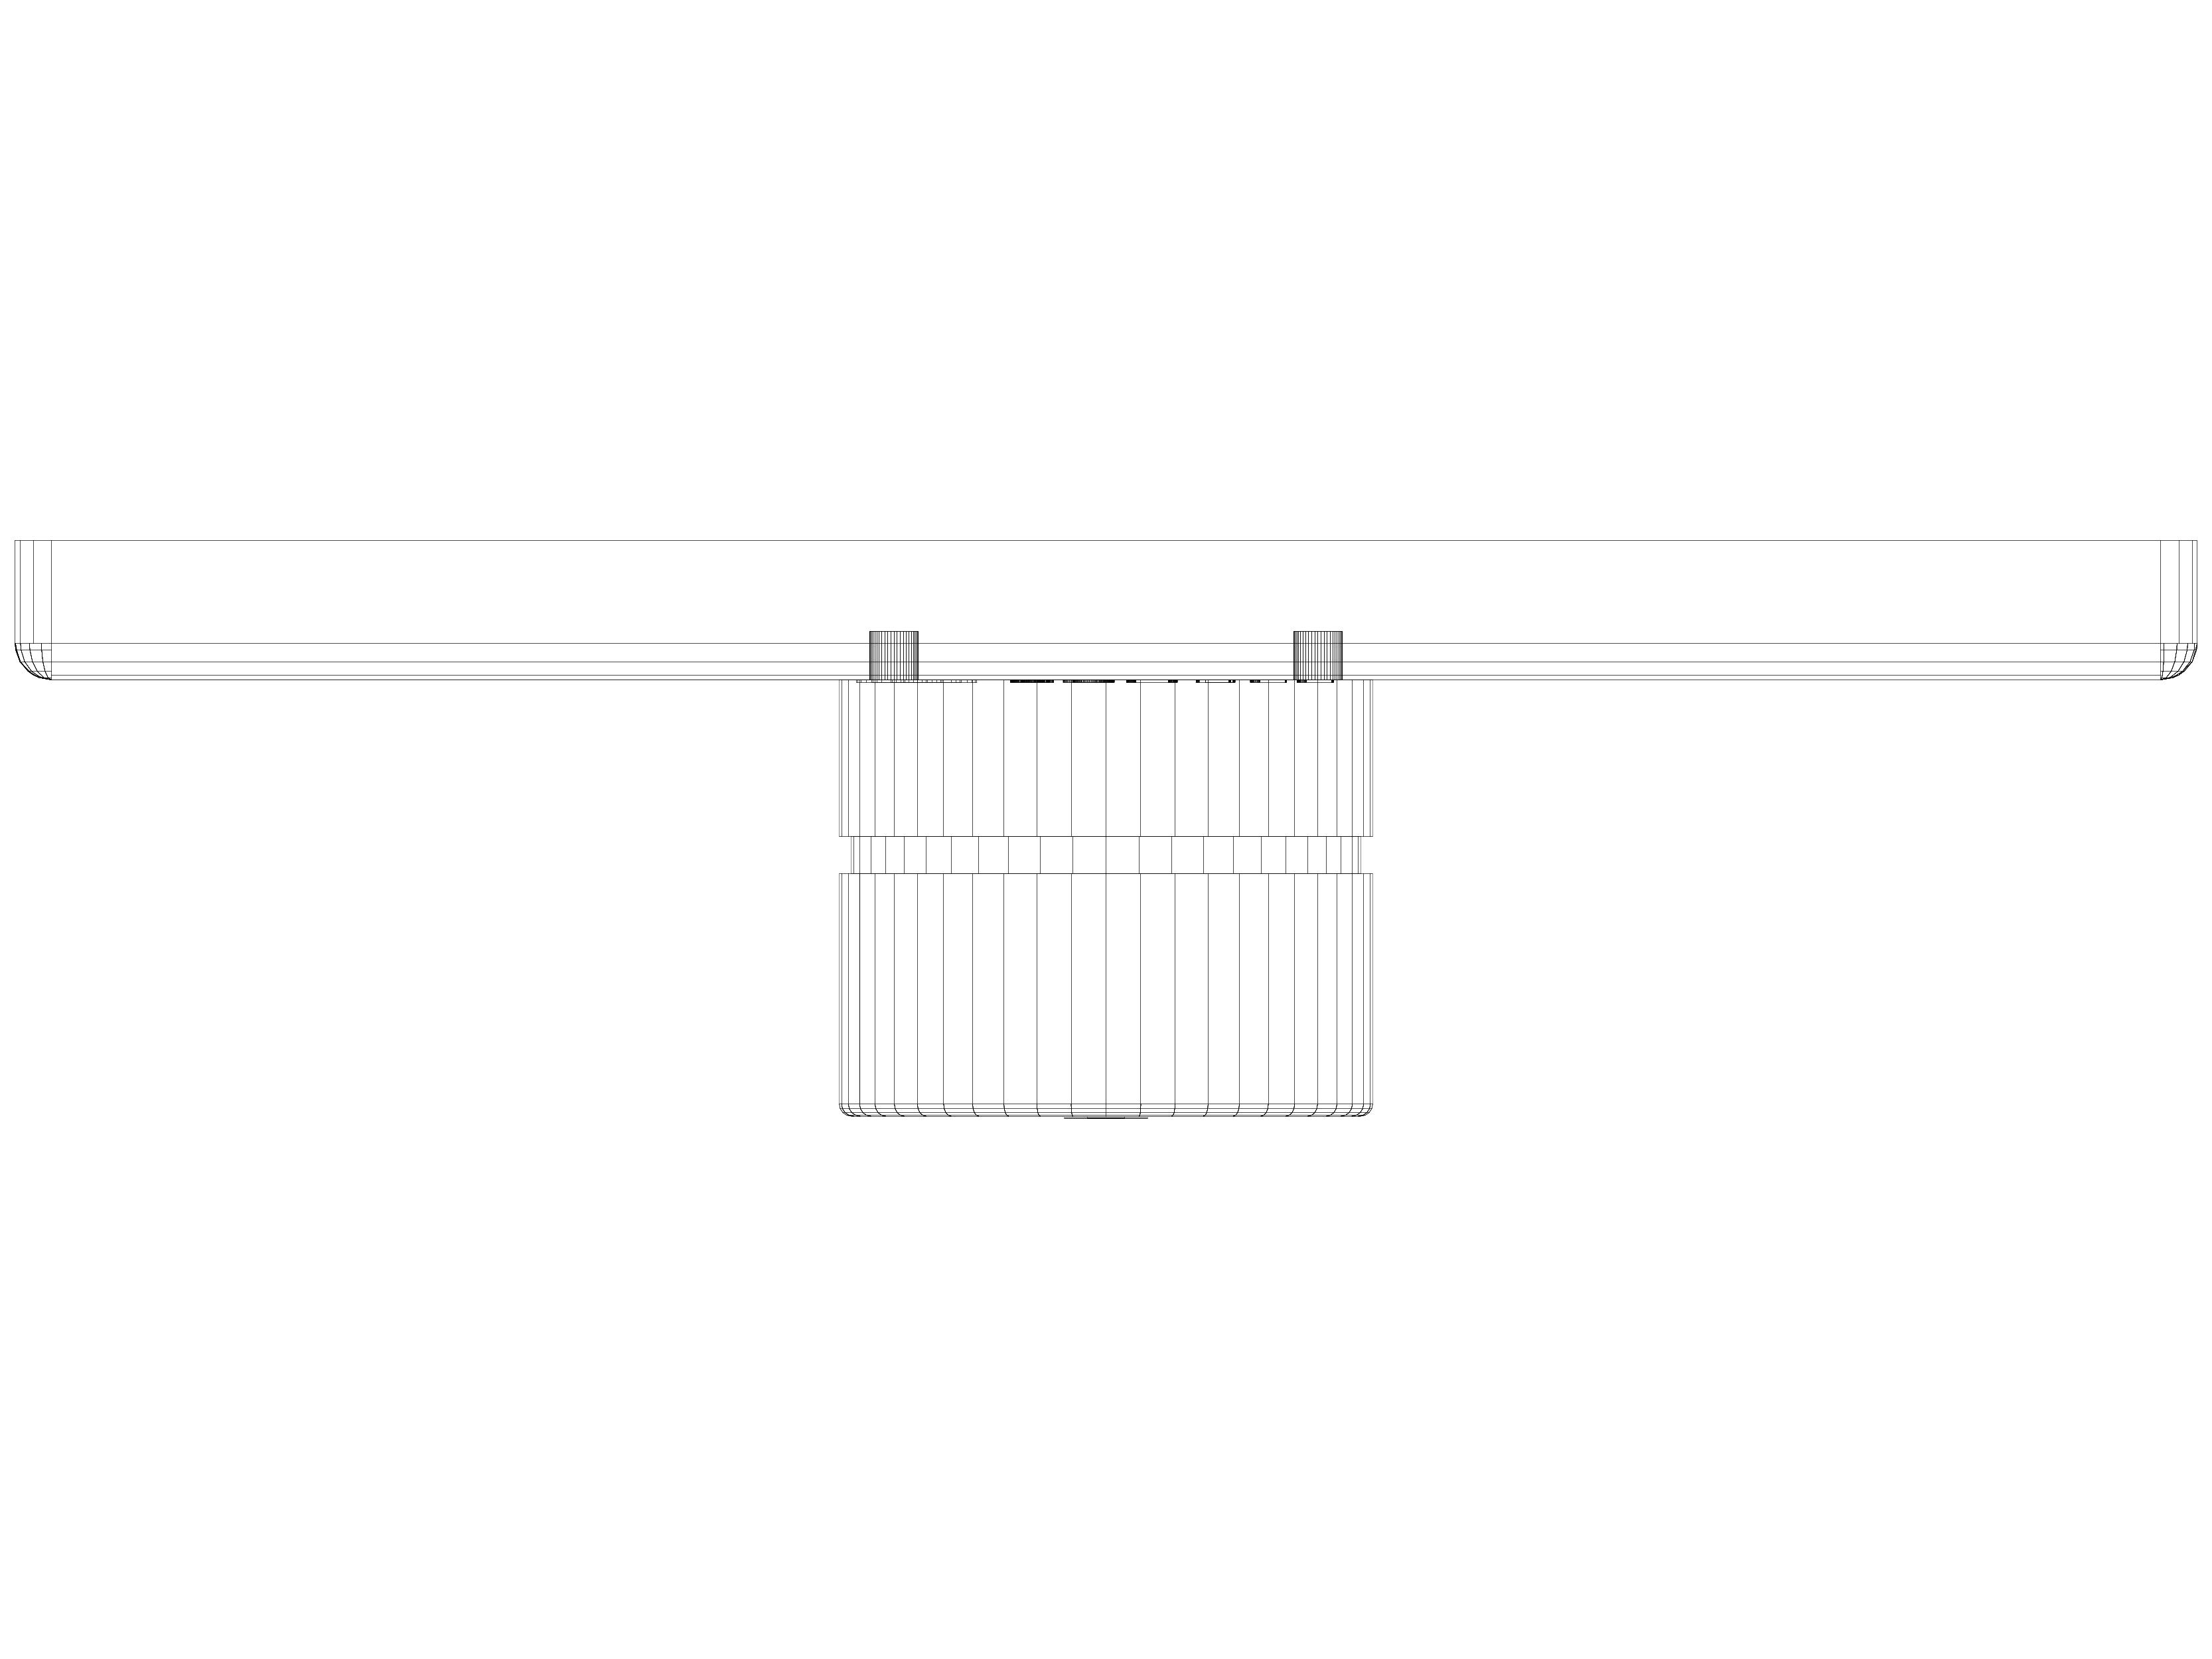 Pagina 1 - CAD-DWG Baterie cu montare in perete pentru dus SCHELL LINUS D-SC-M 01 832 06 99 SCHELL...